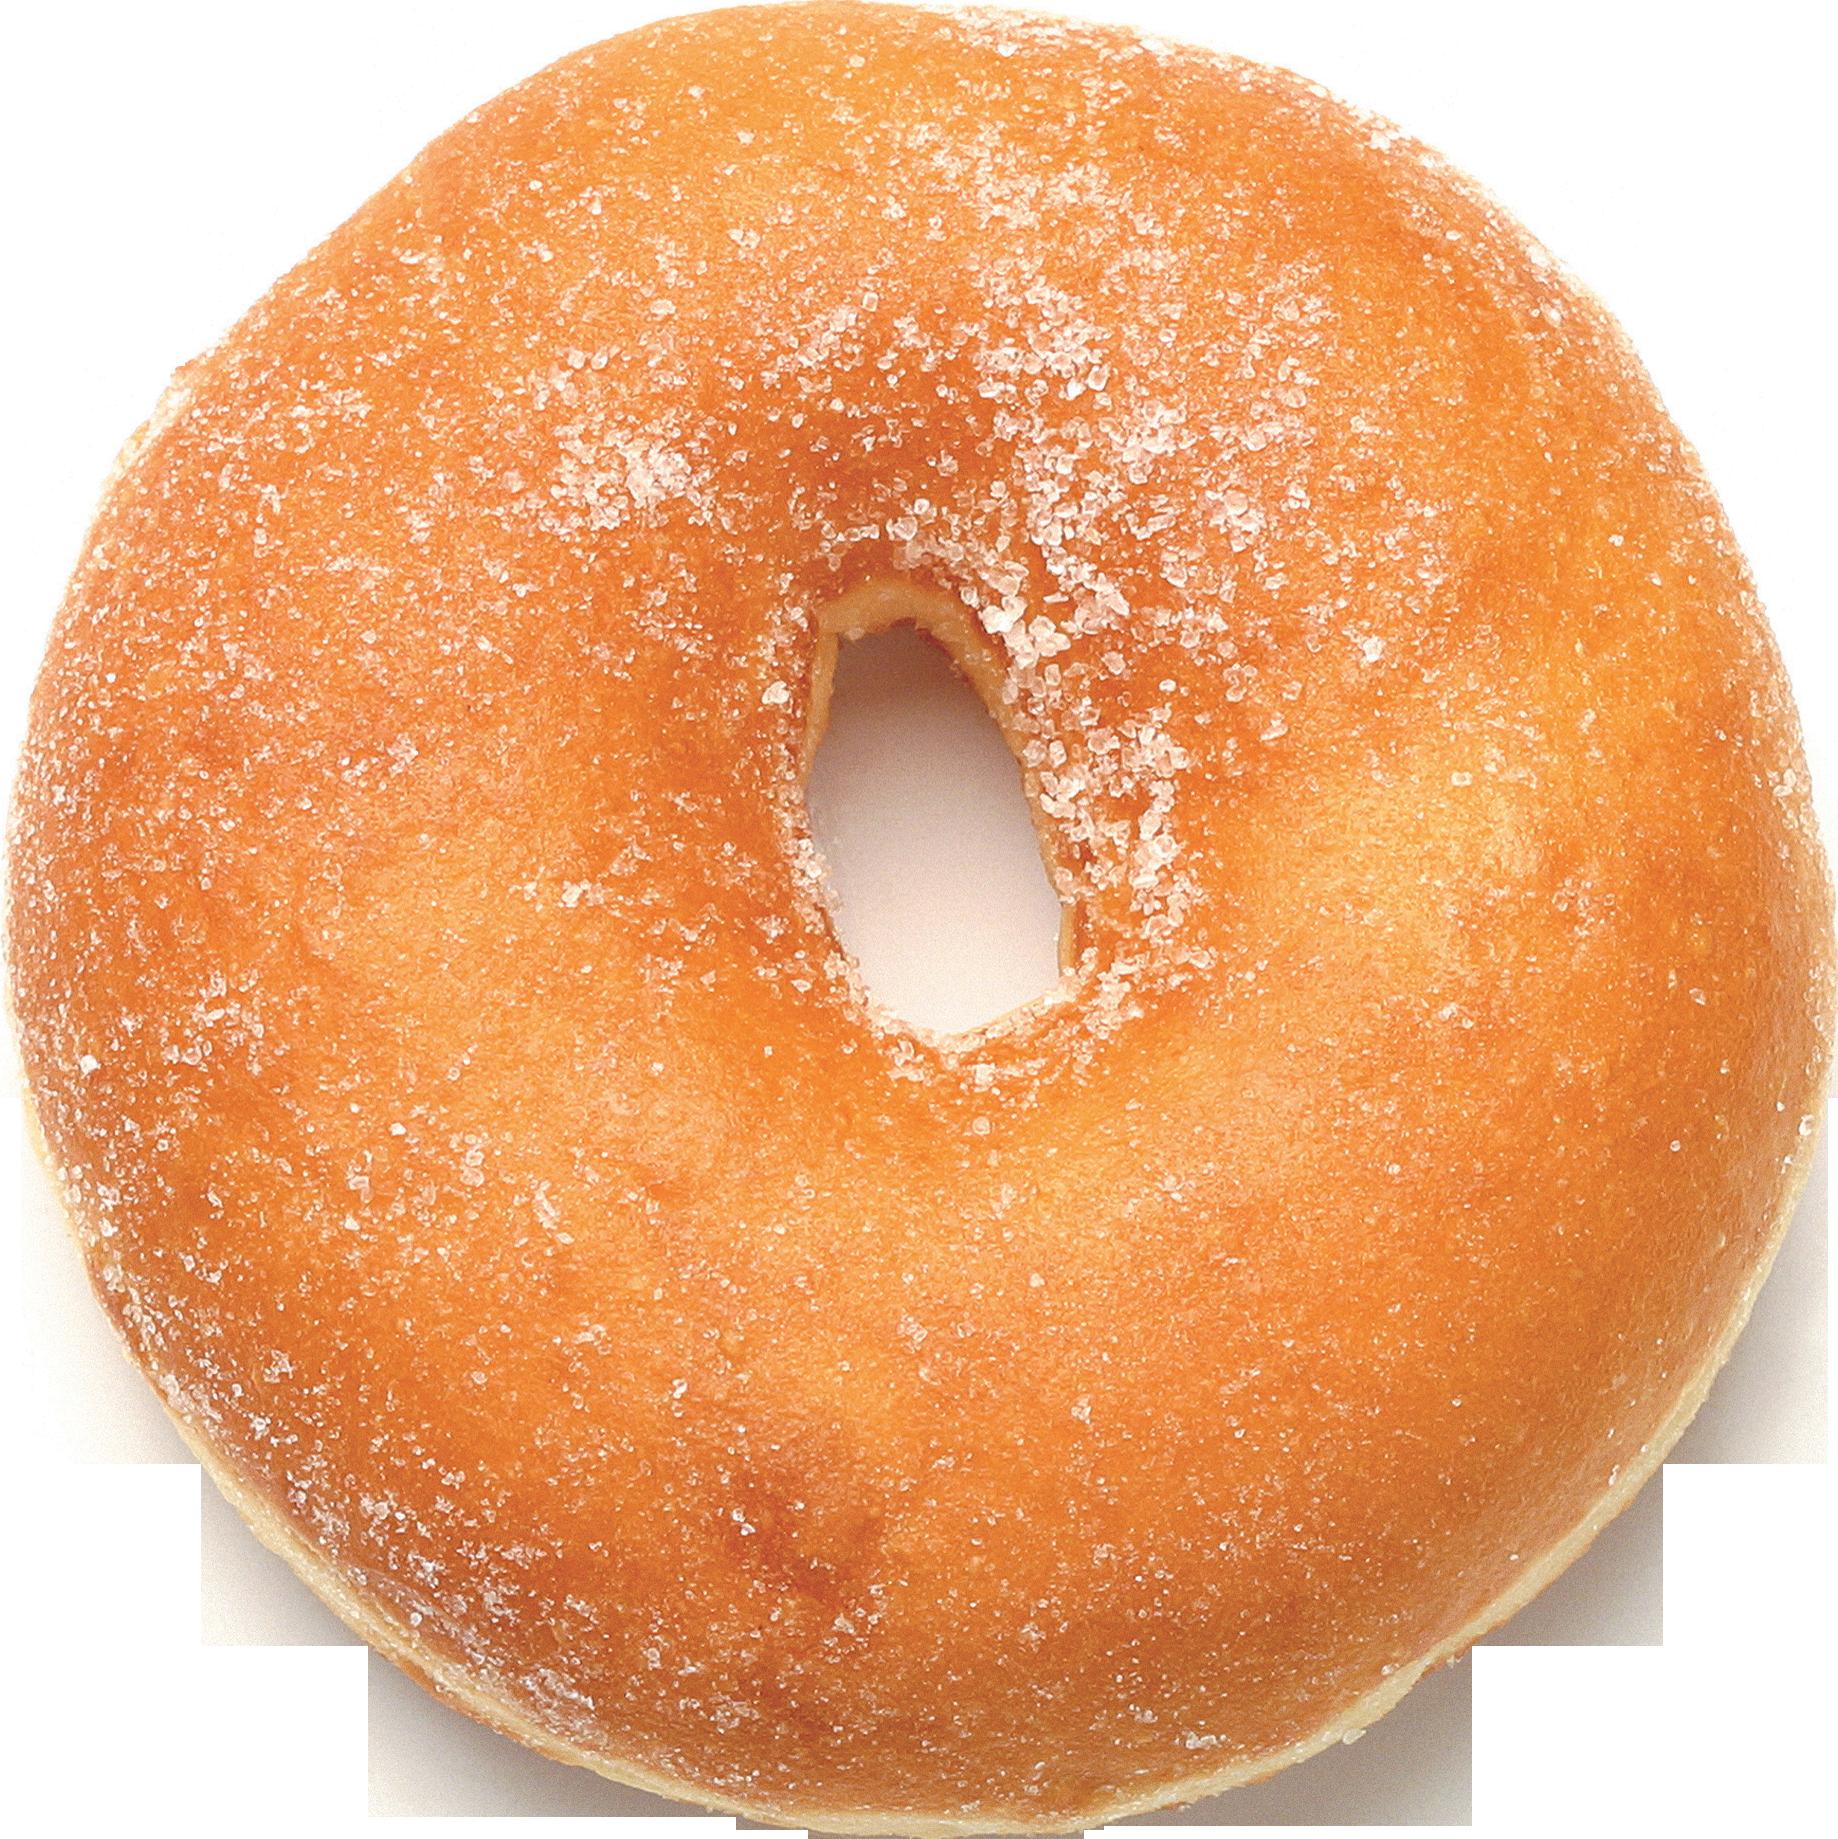 Donut PNG Image.